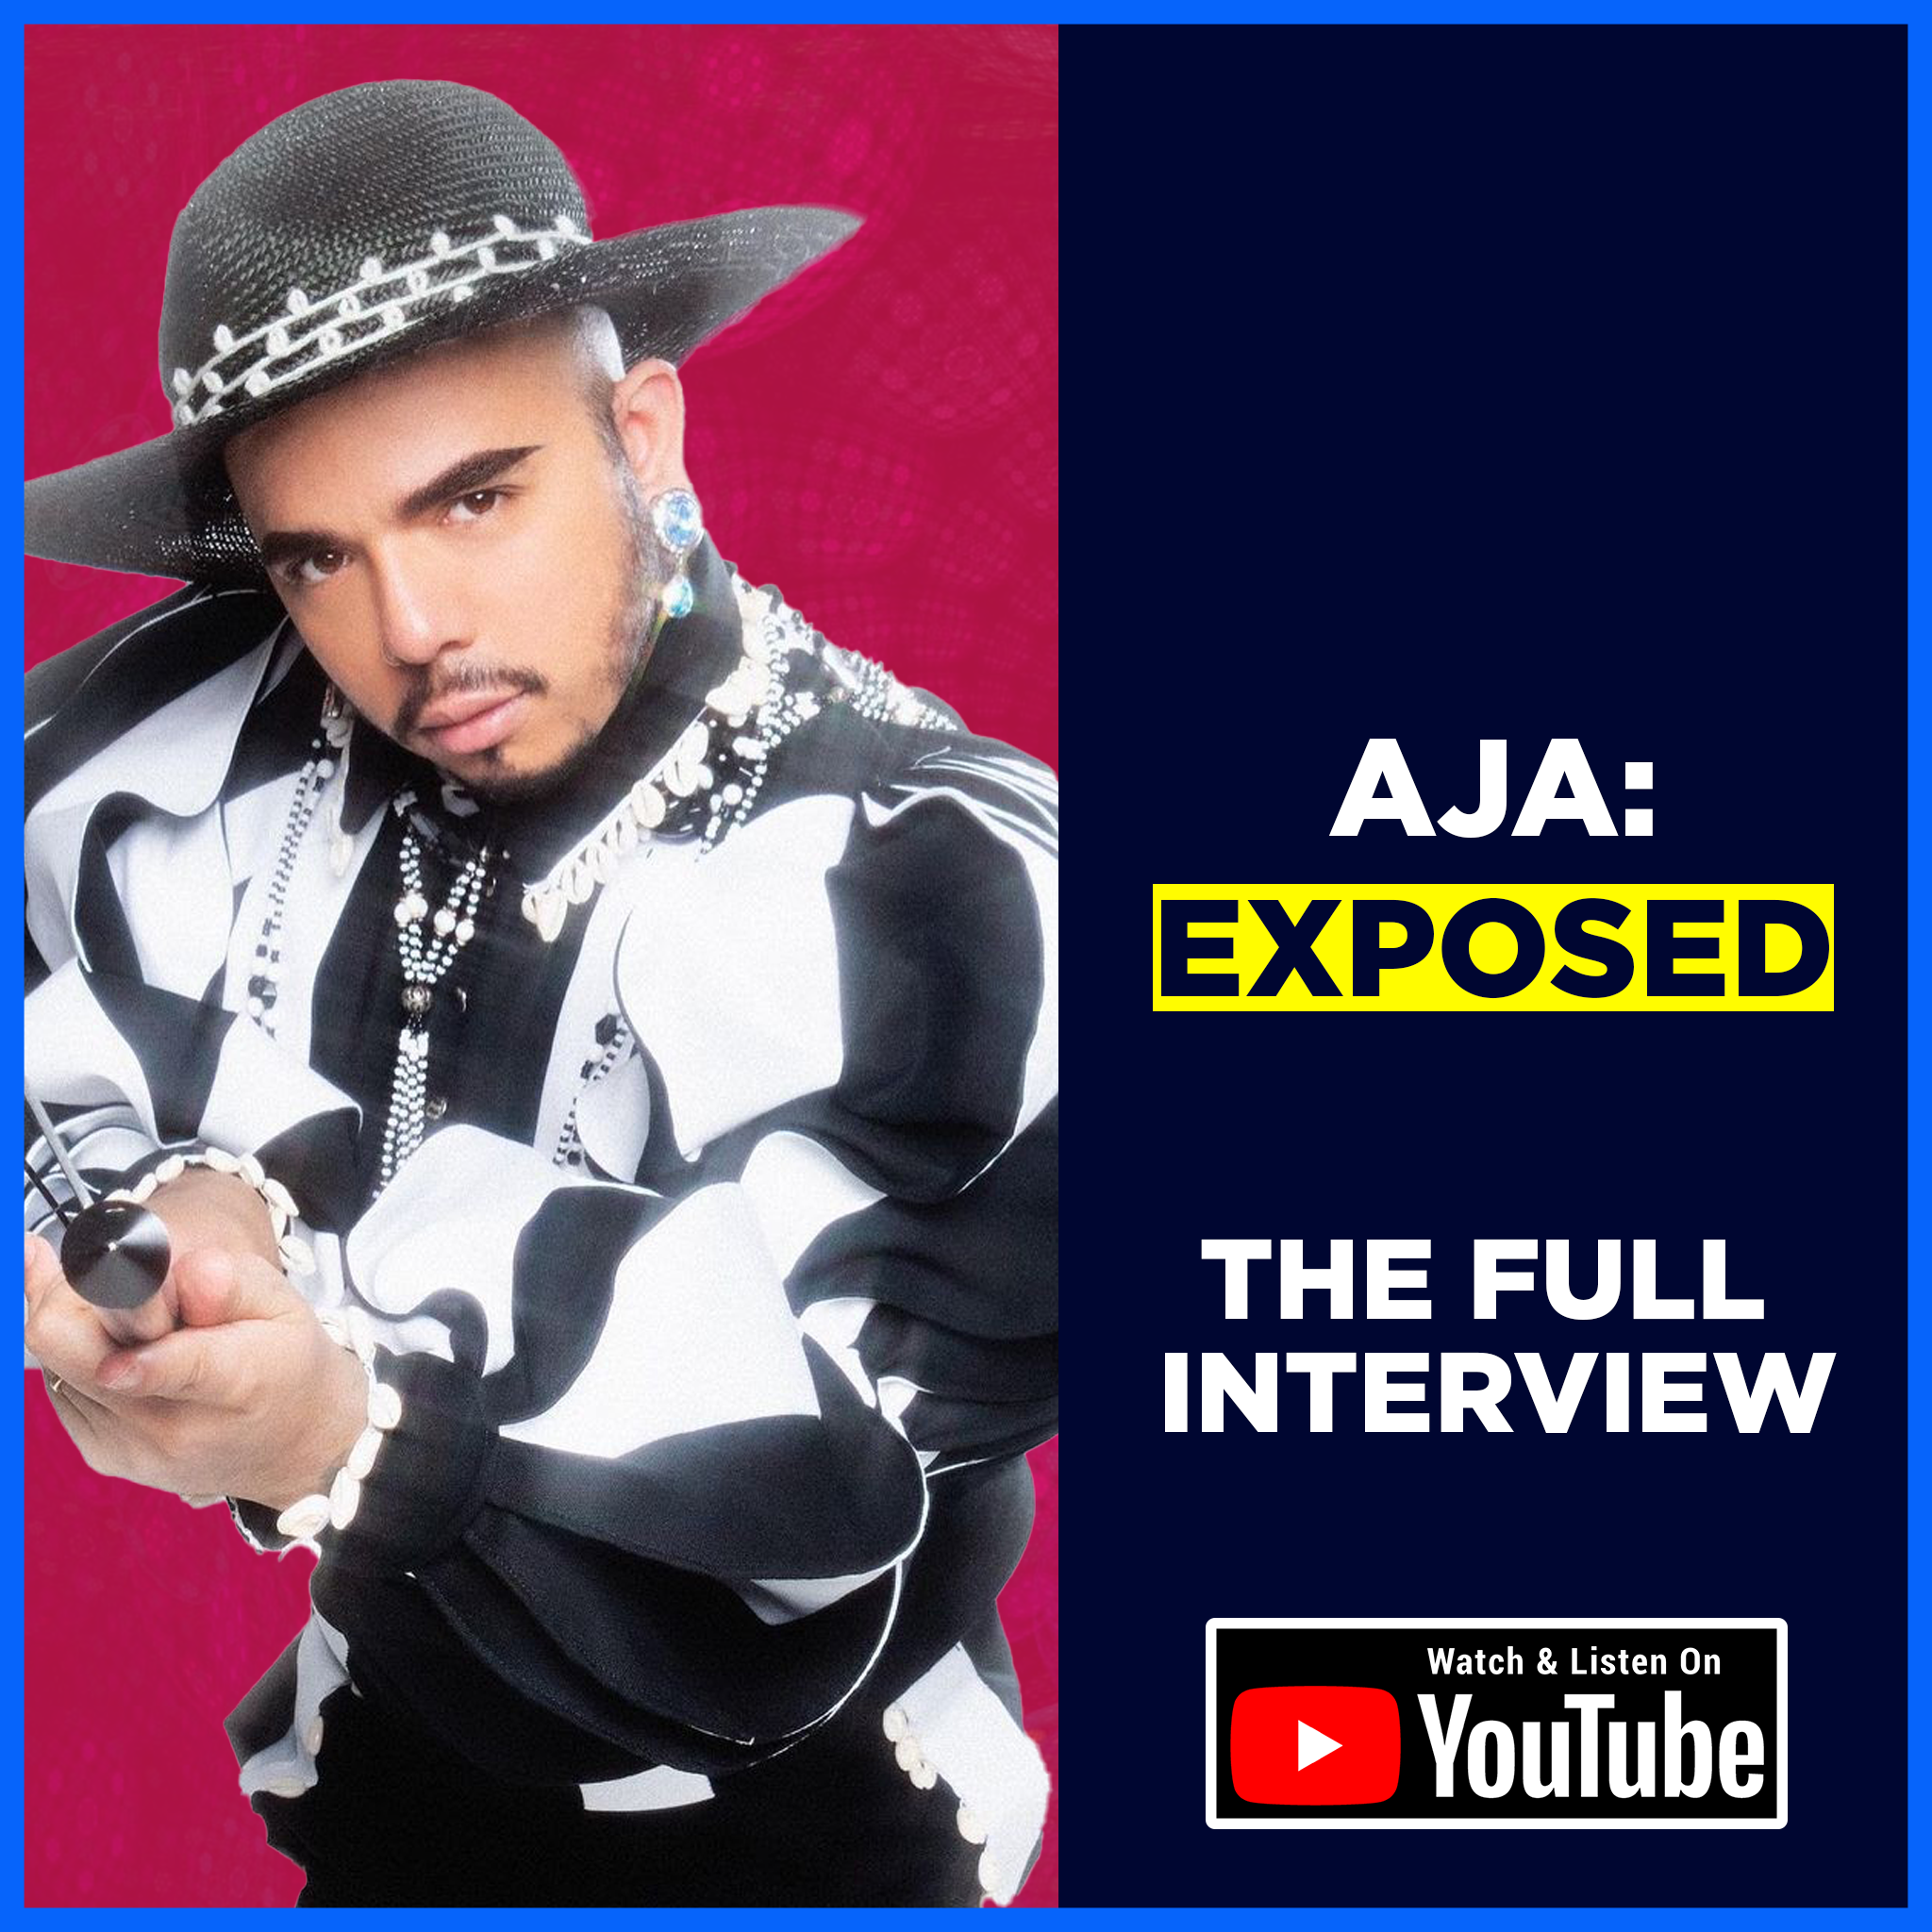 S3E4 - Aja: Exposed (The Full Interview)